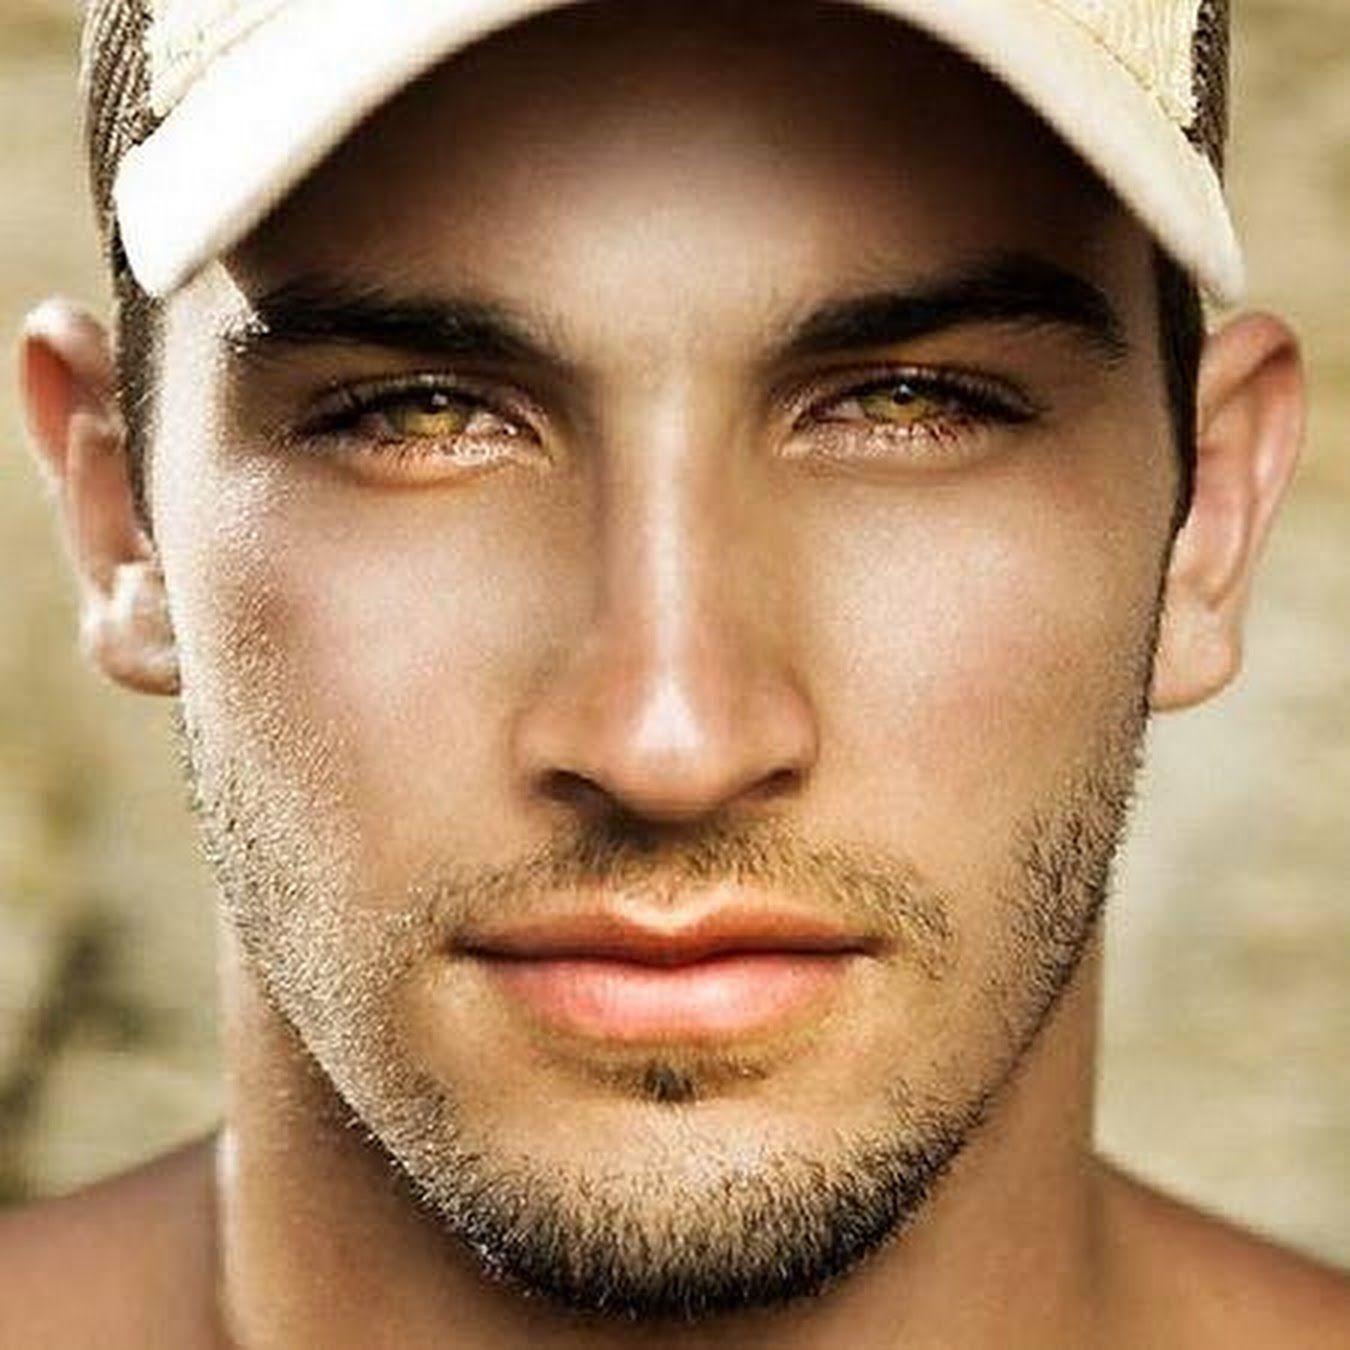 Black guys with blue eyes tumblr